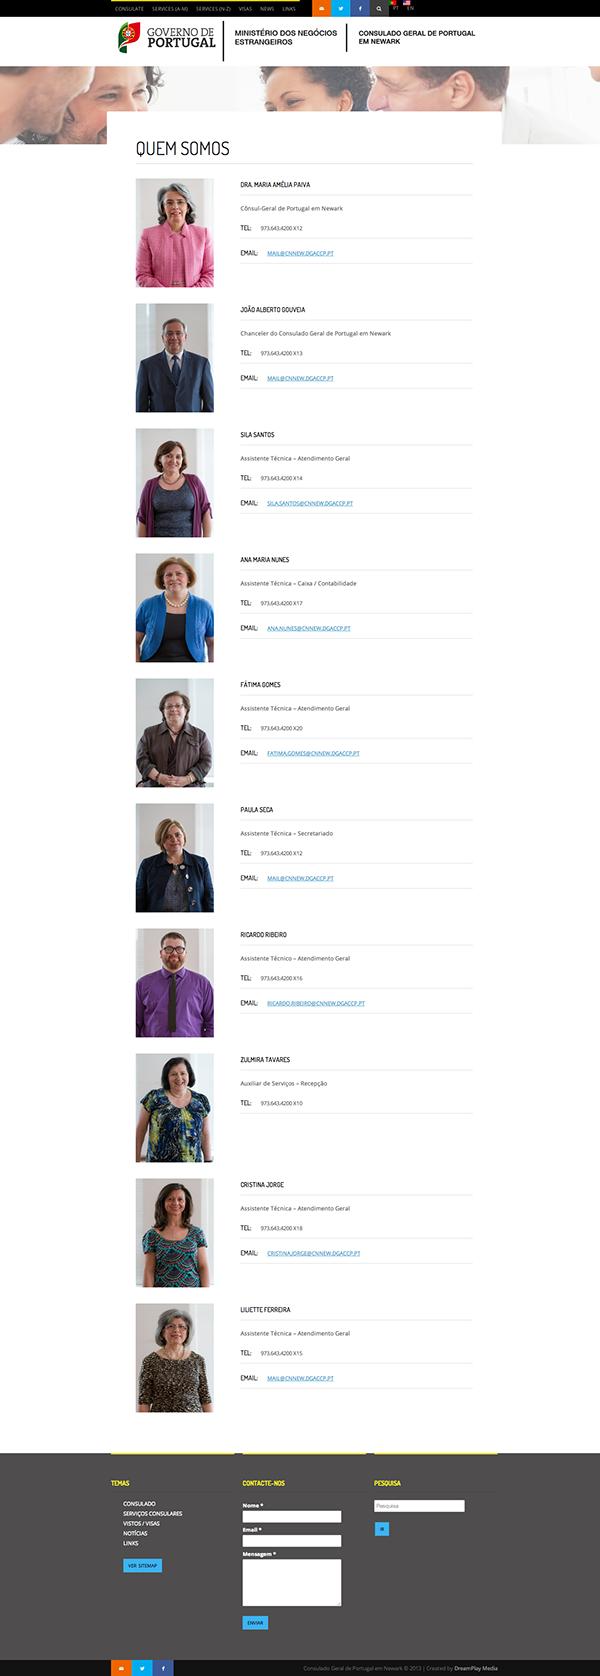 Web: Government of Portugal - Newark Consulate